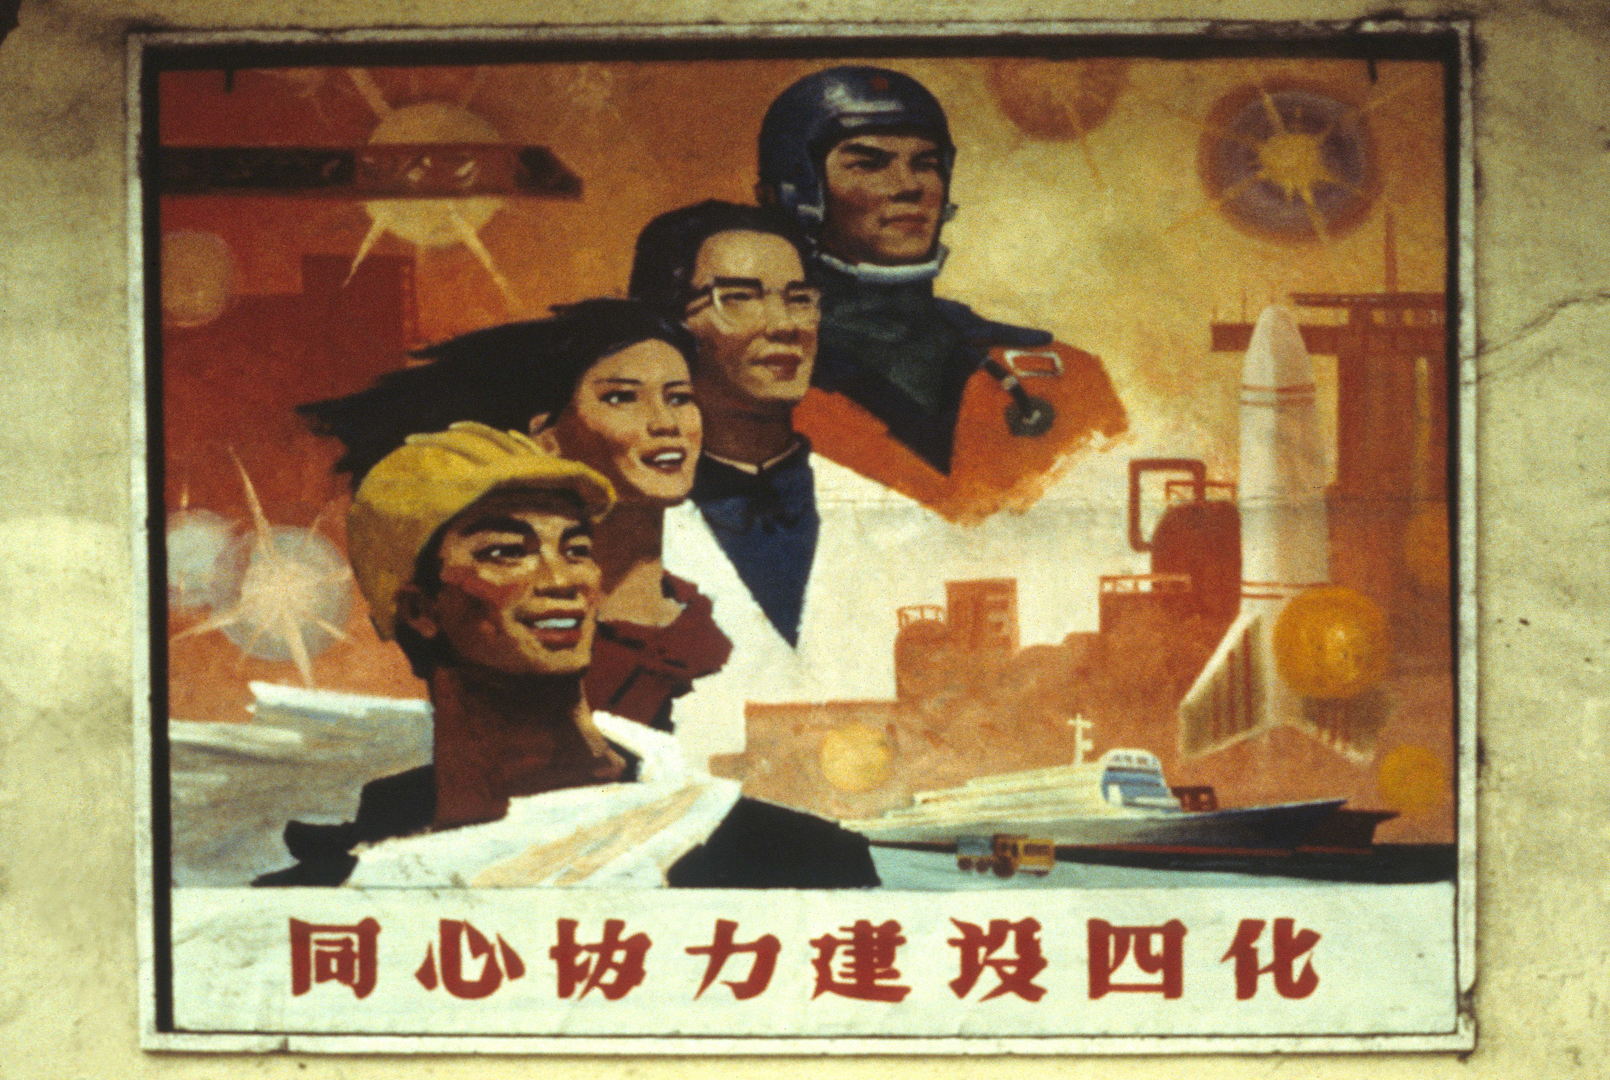 Unite for Modernization 1982 (22 x 14.75)